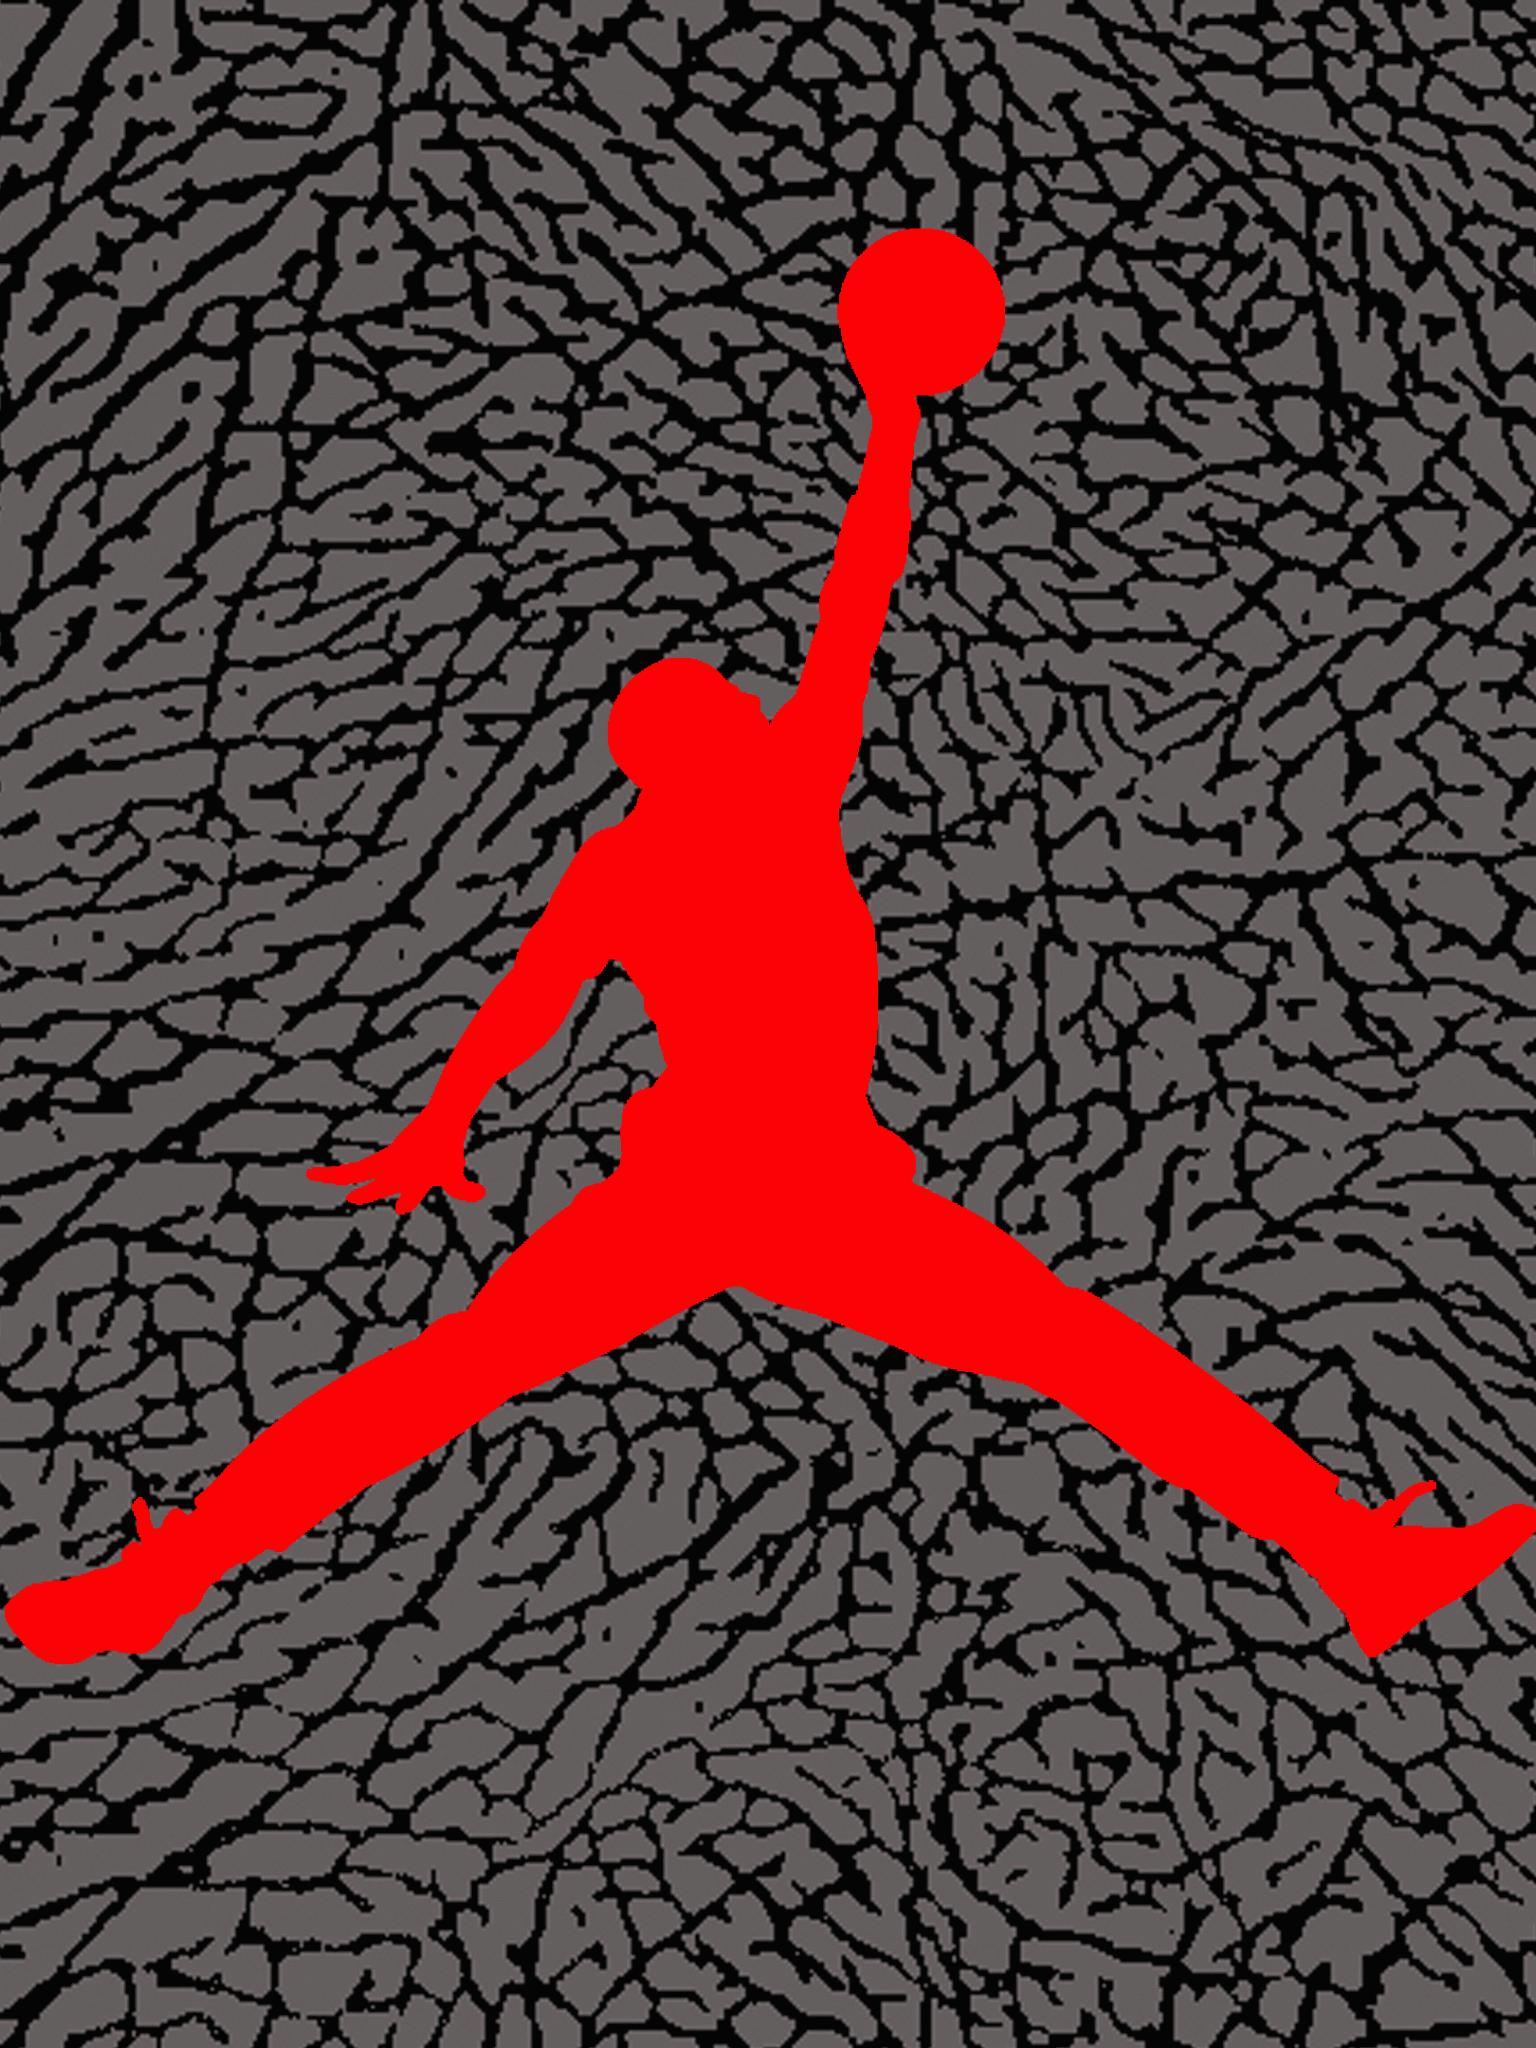 Free Download Air Jordan Wallpapers 3840x2160 For Your